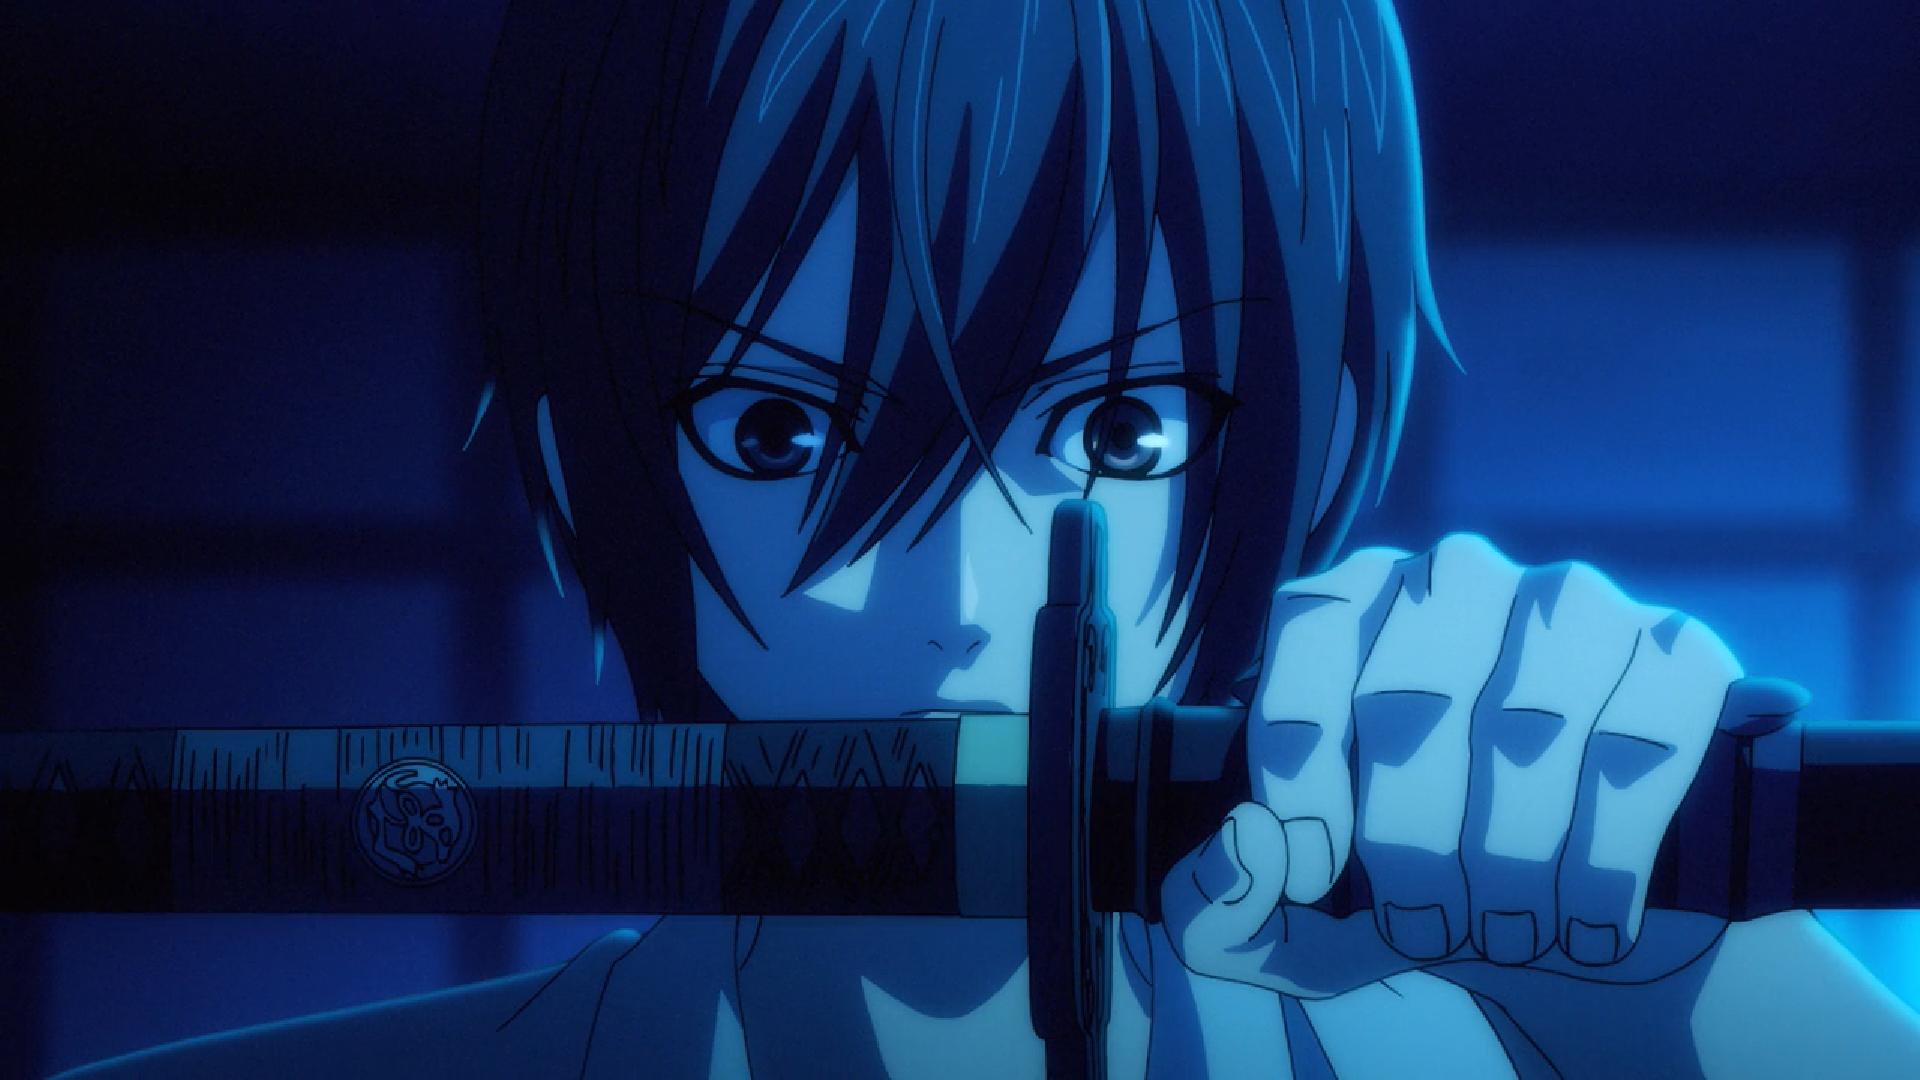 Sword Gai The Animation